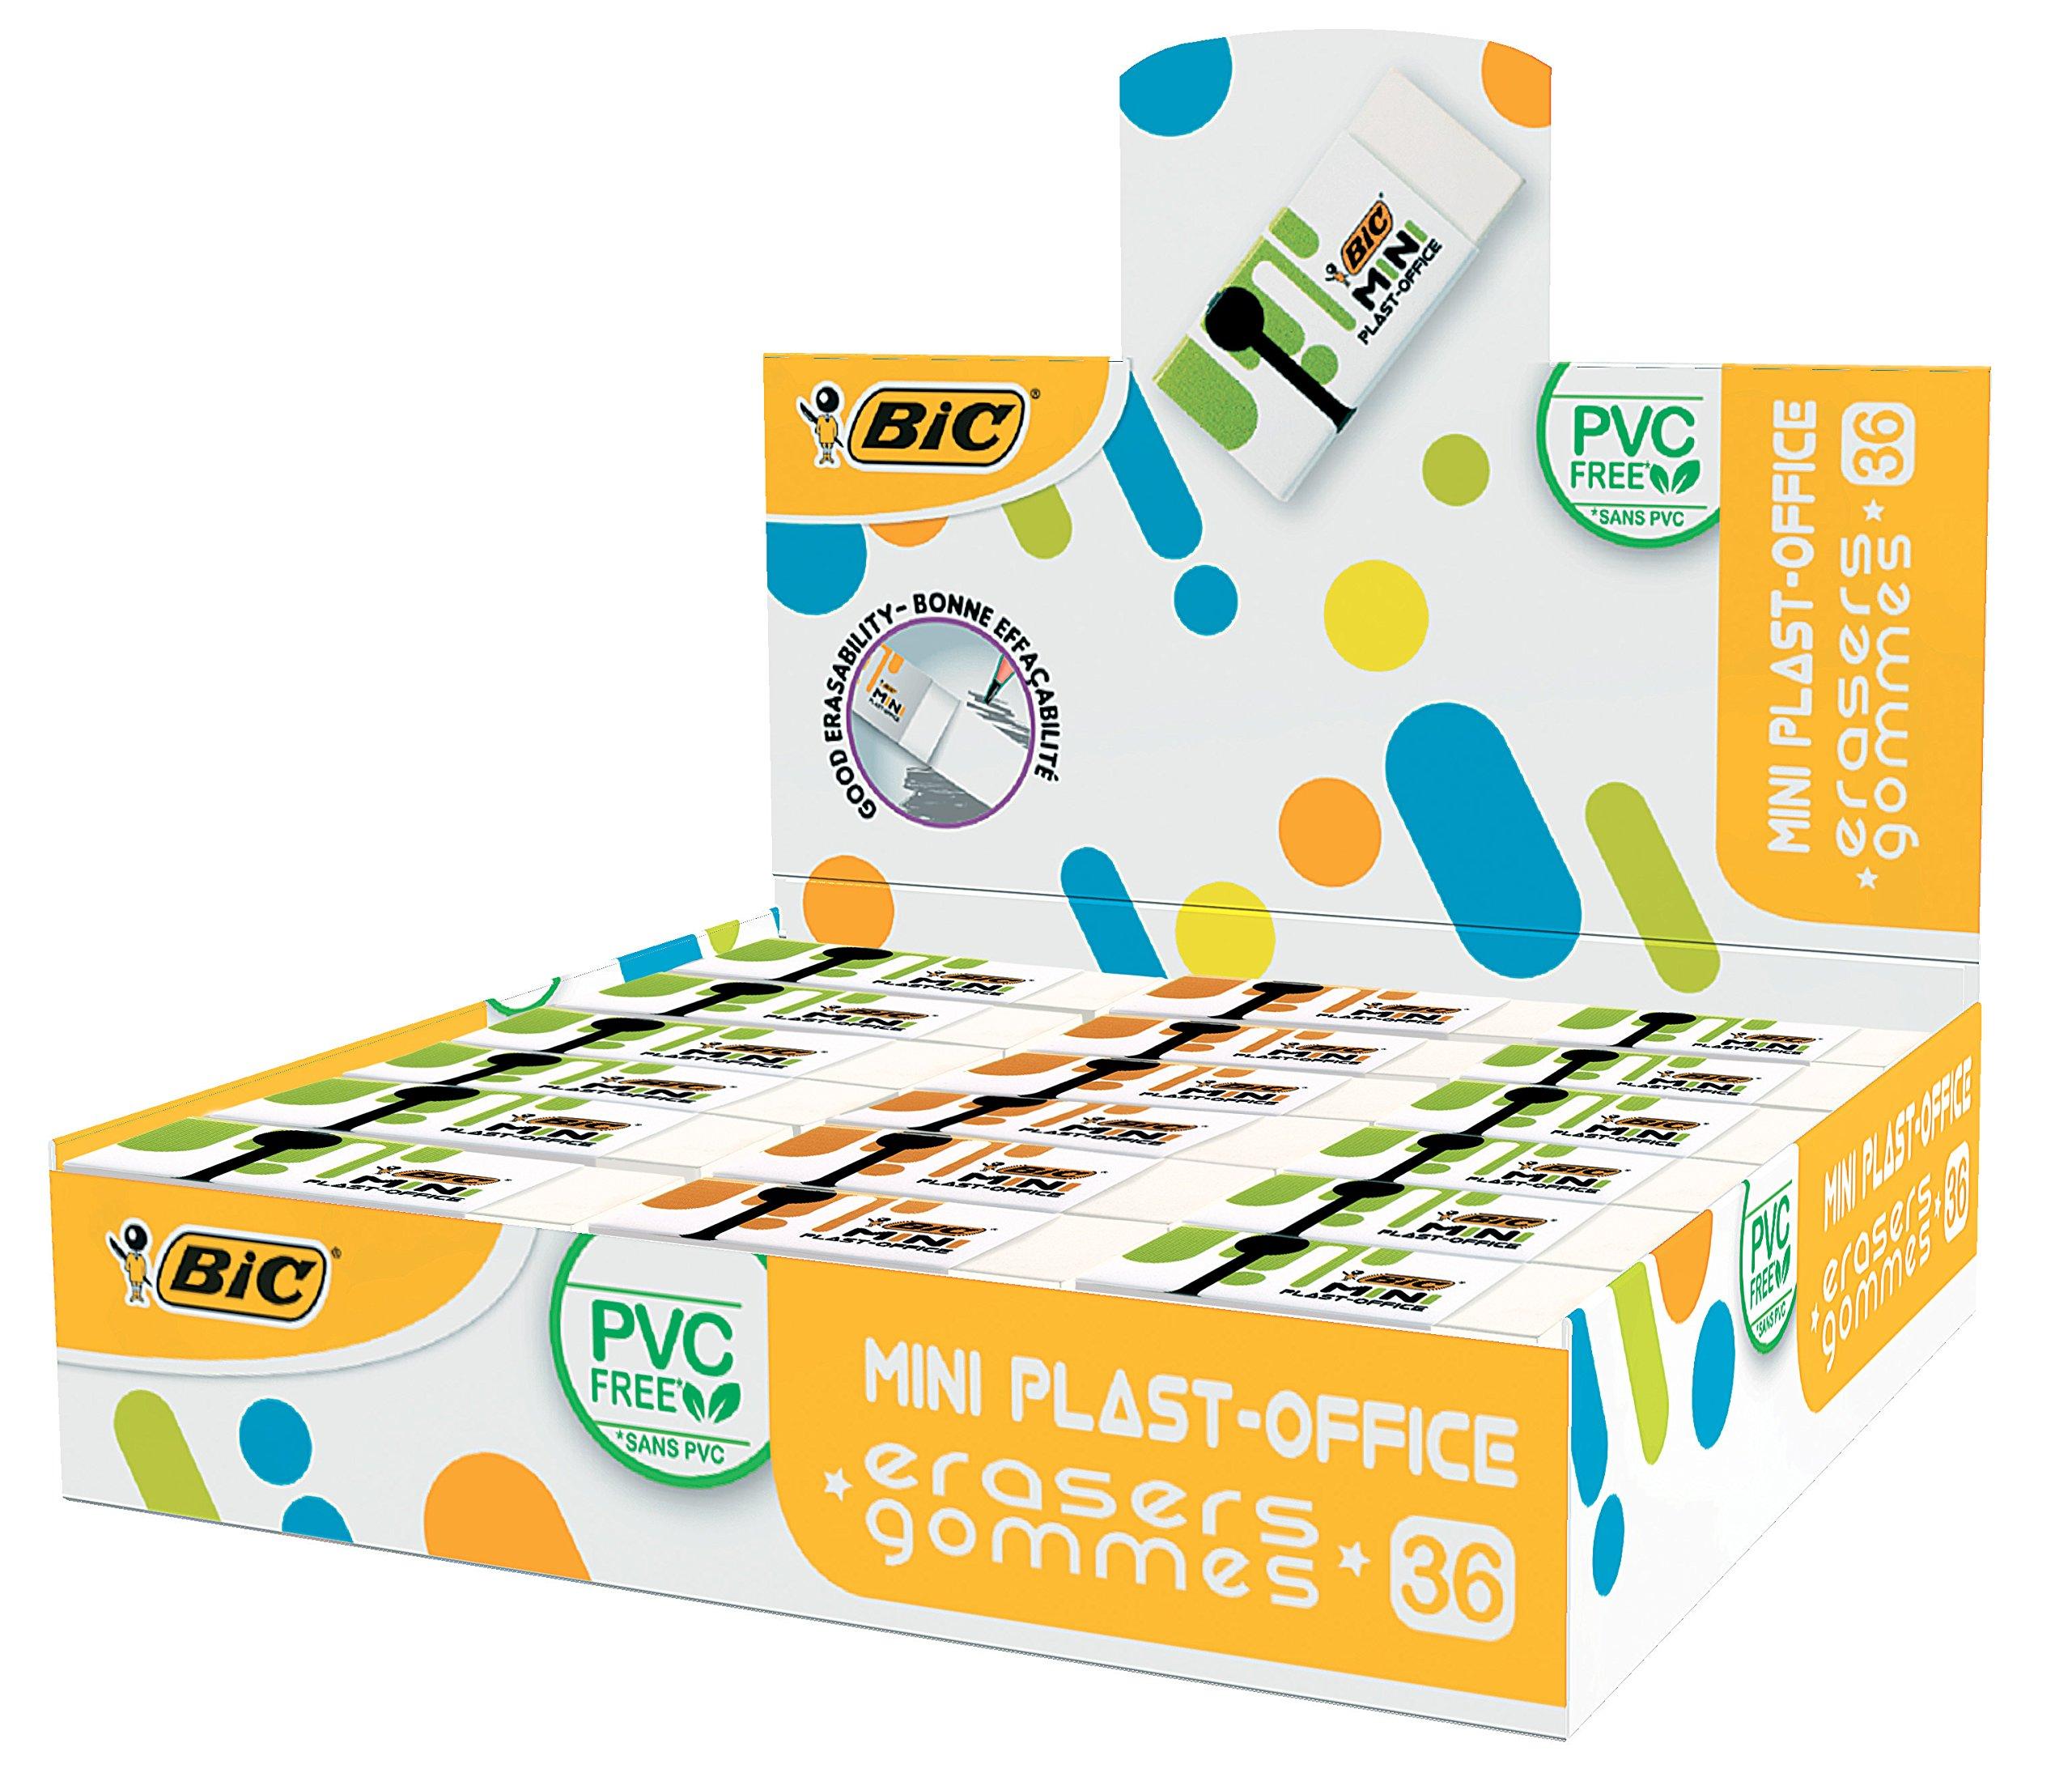 Bic 939376Eraser Mini Plastic Office, No PVC, 41× 18.5x 11.5mm; 36)